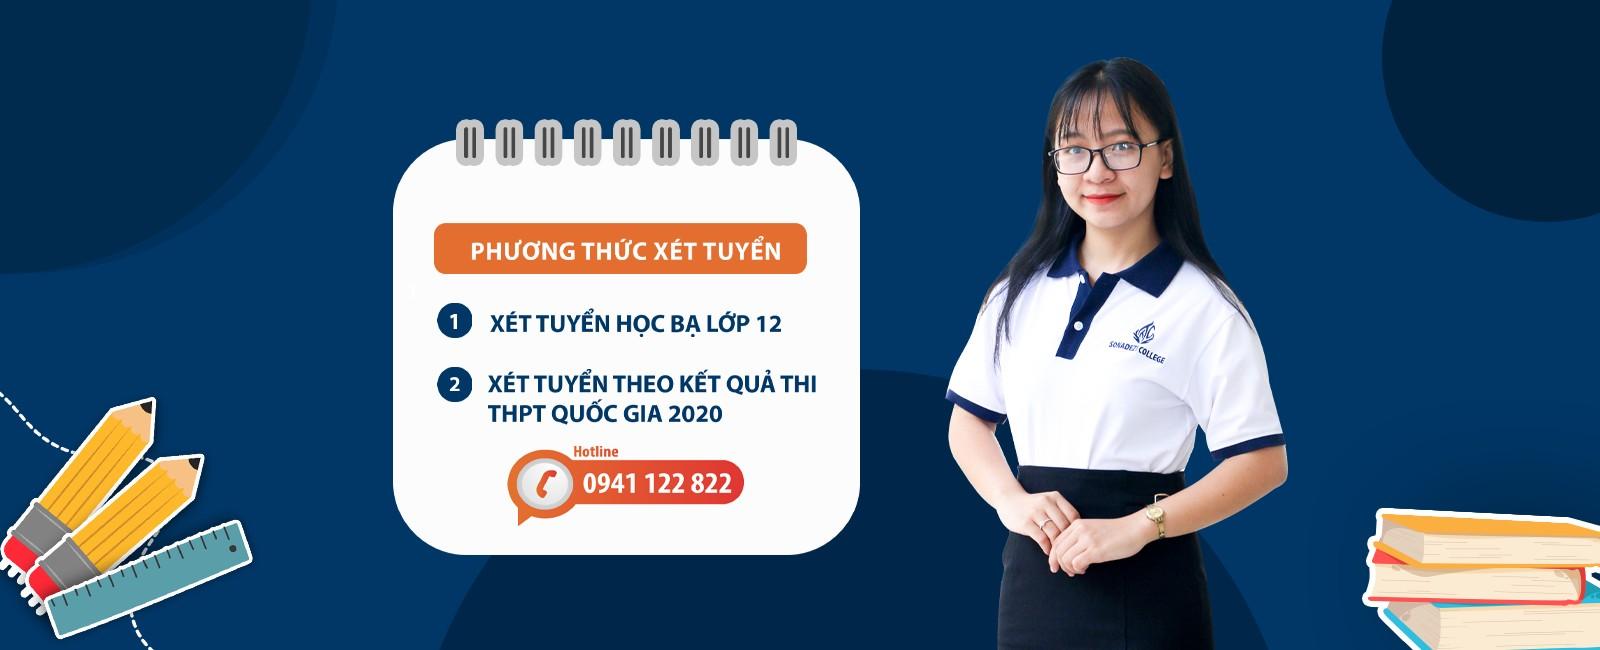 /Uploads/files/2020-02/2-Phuong-Thuc-Xet-Tuyen-2020.jpg